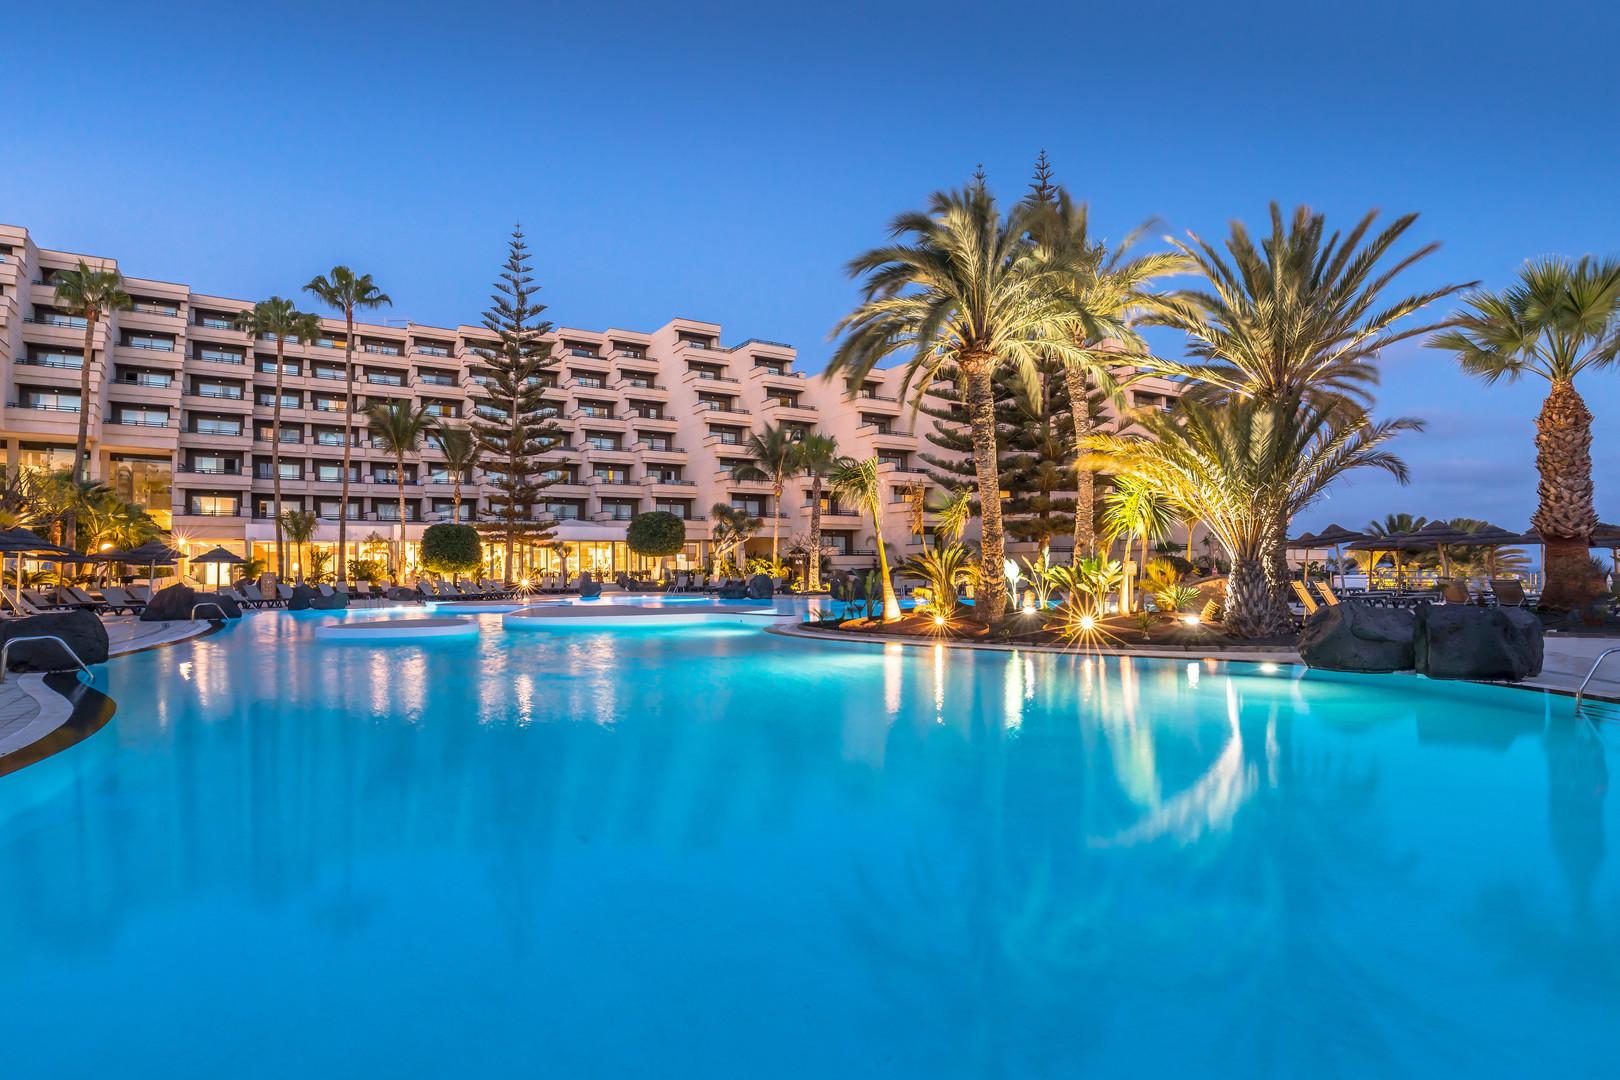 Hotel Occidental Lanzarote Playa #5